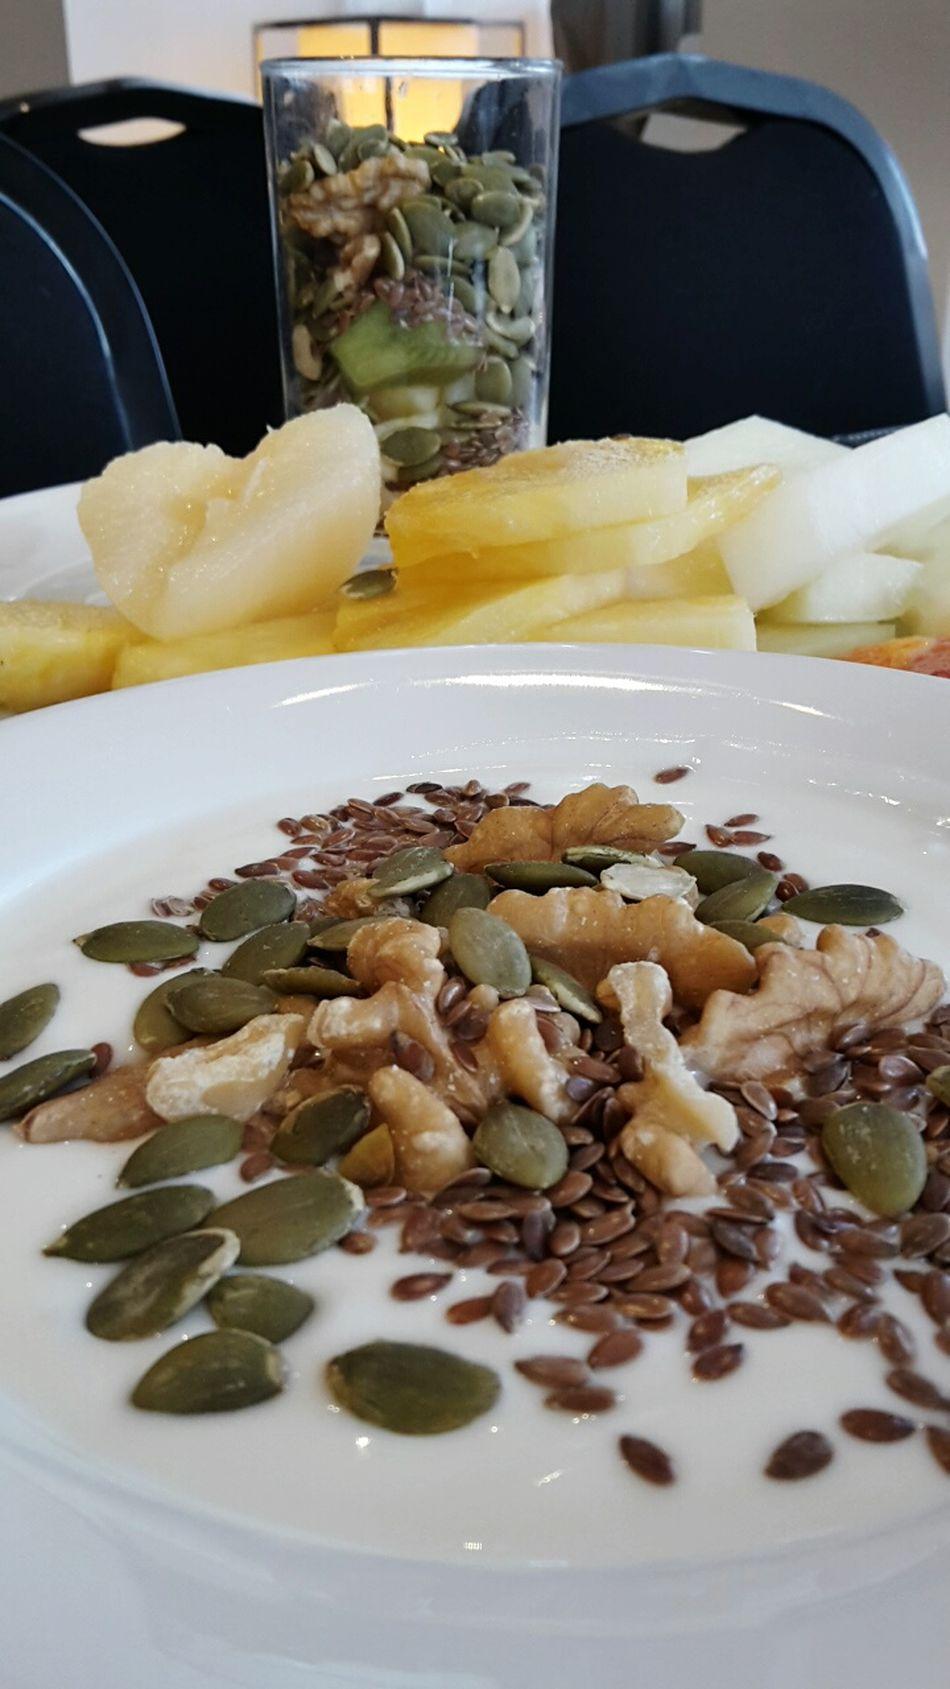 My Favorite Breakfast Moment Yogurth and Sunflower Seeds Flax Seeds Walnuts Fresh Fruits Healthy Food